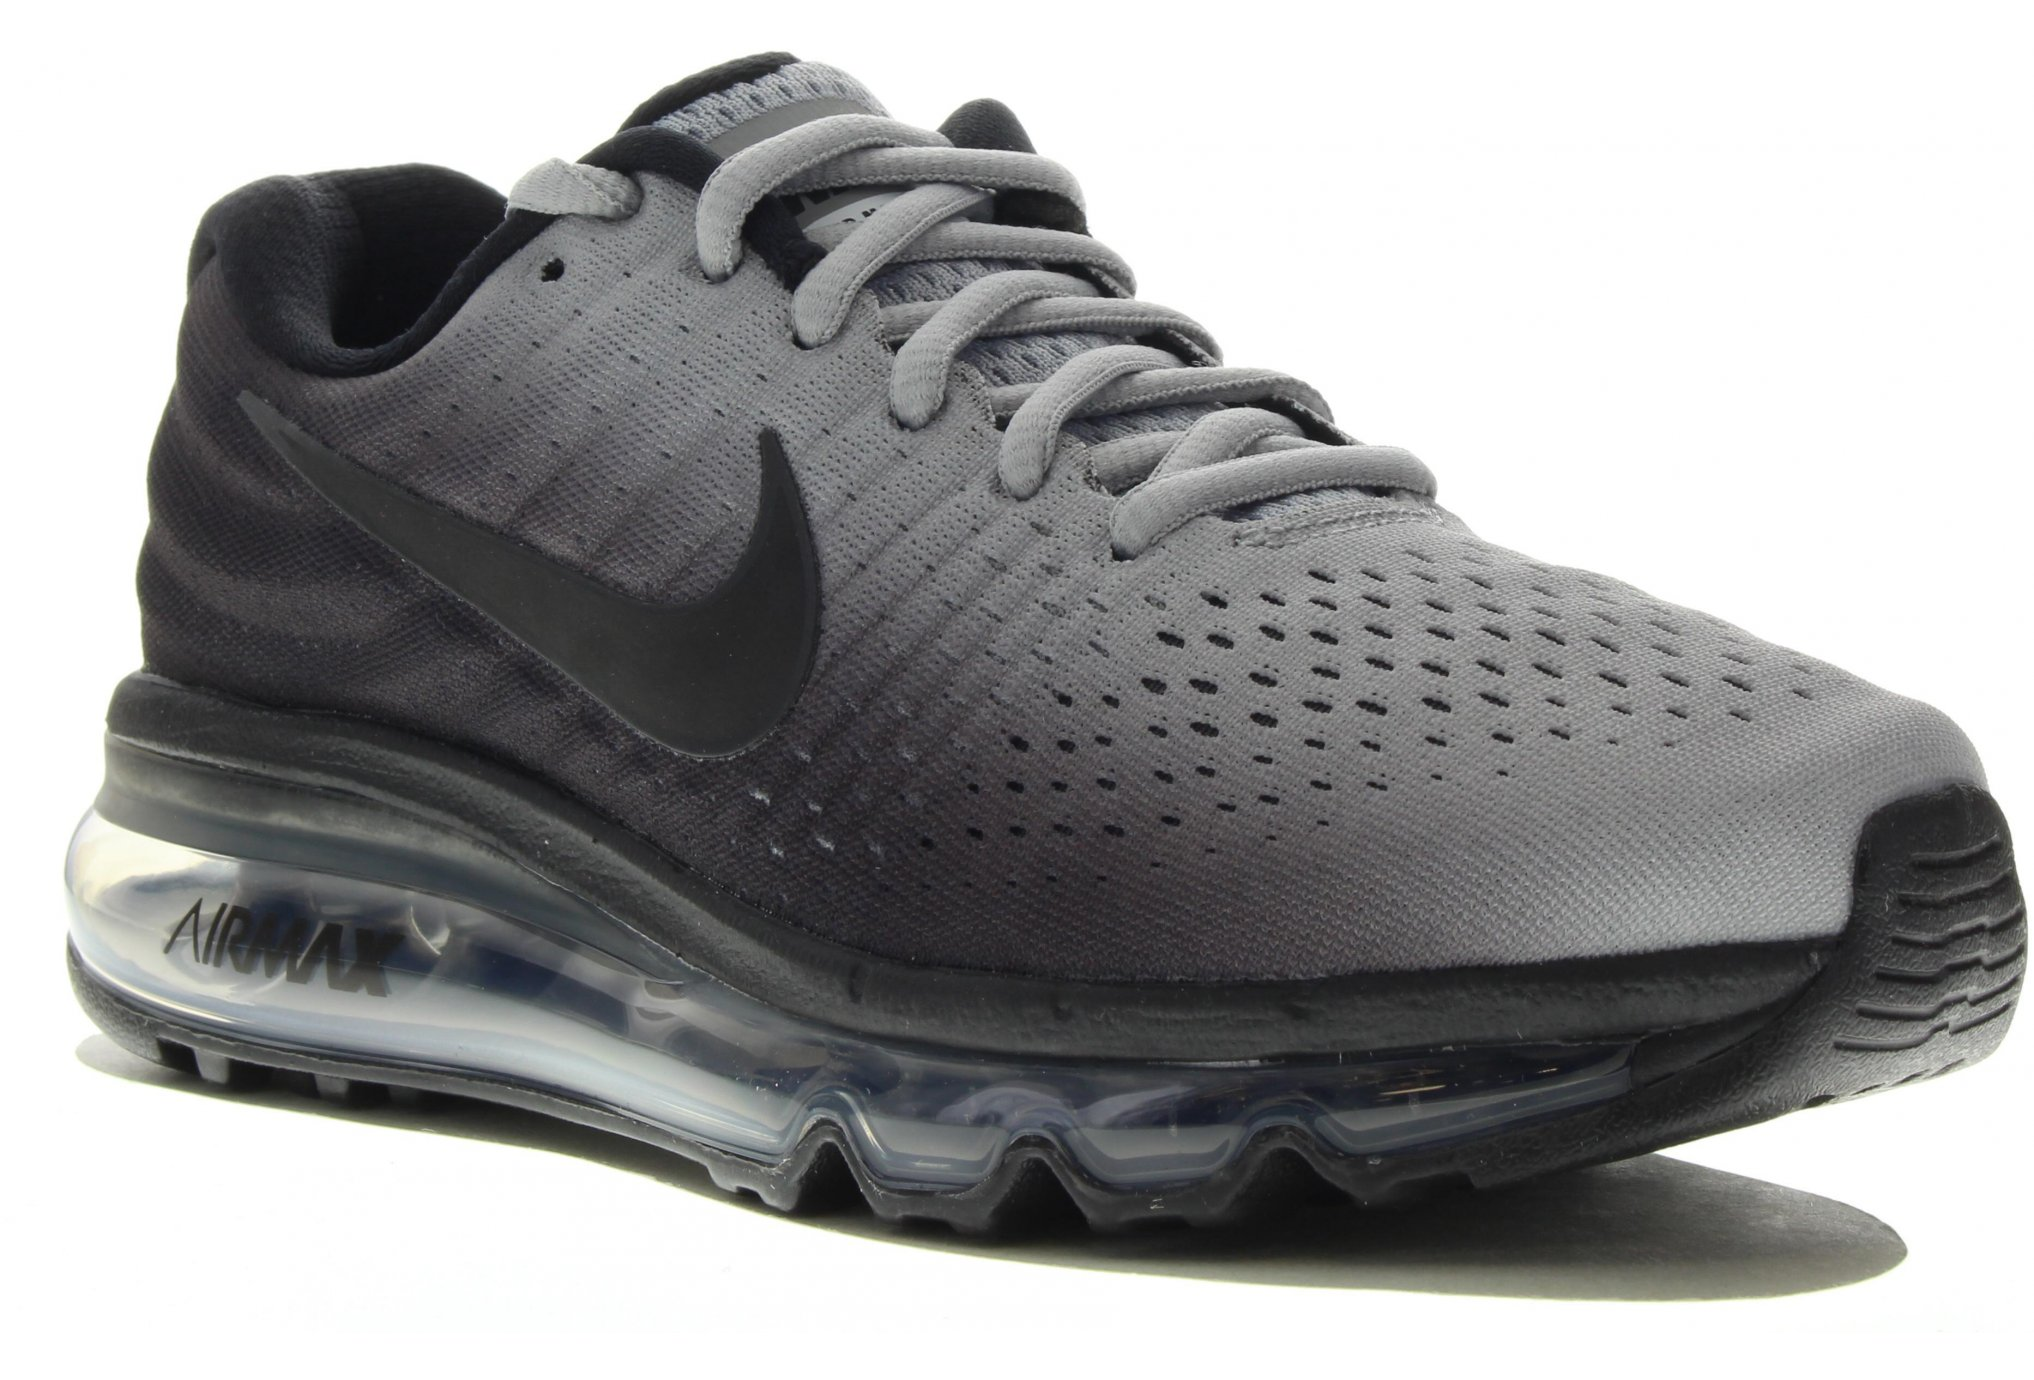 Nike Air Max GS Diététique Chaussures homme